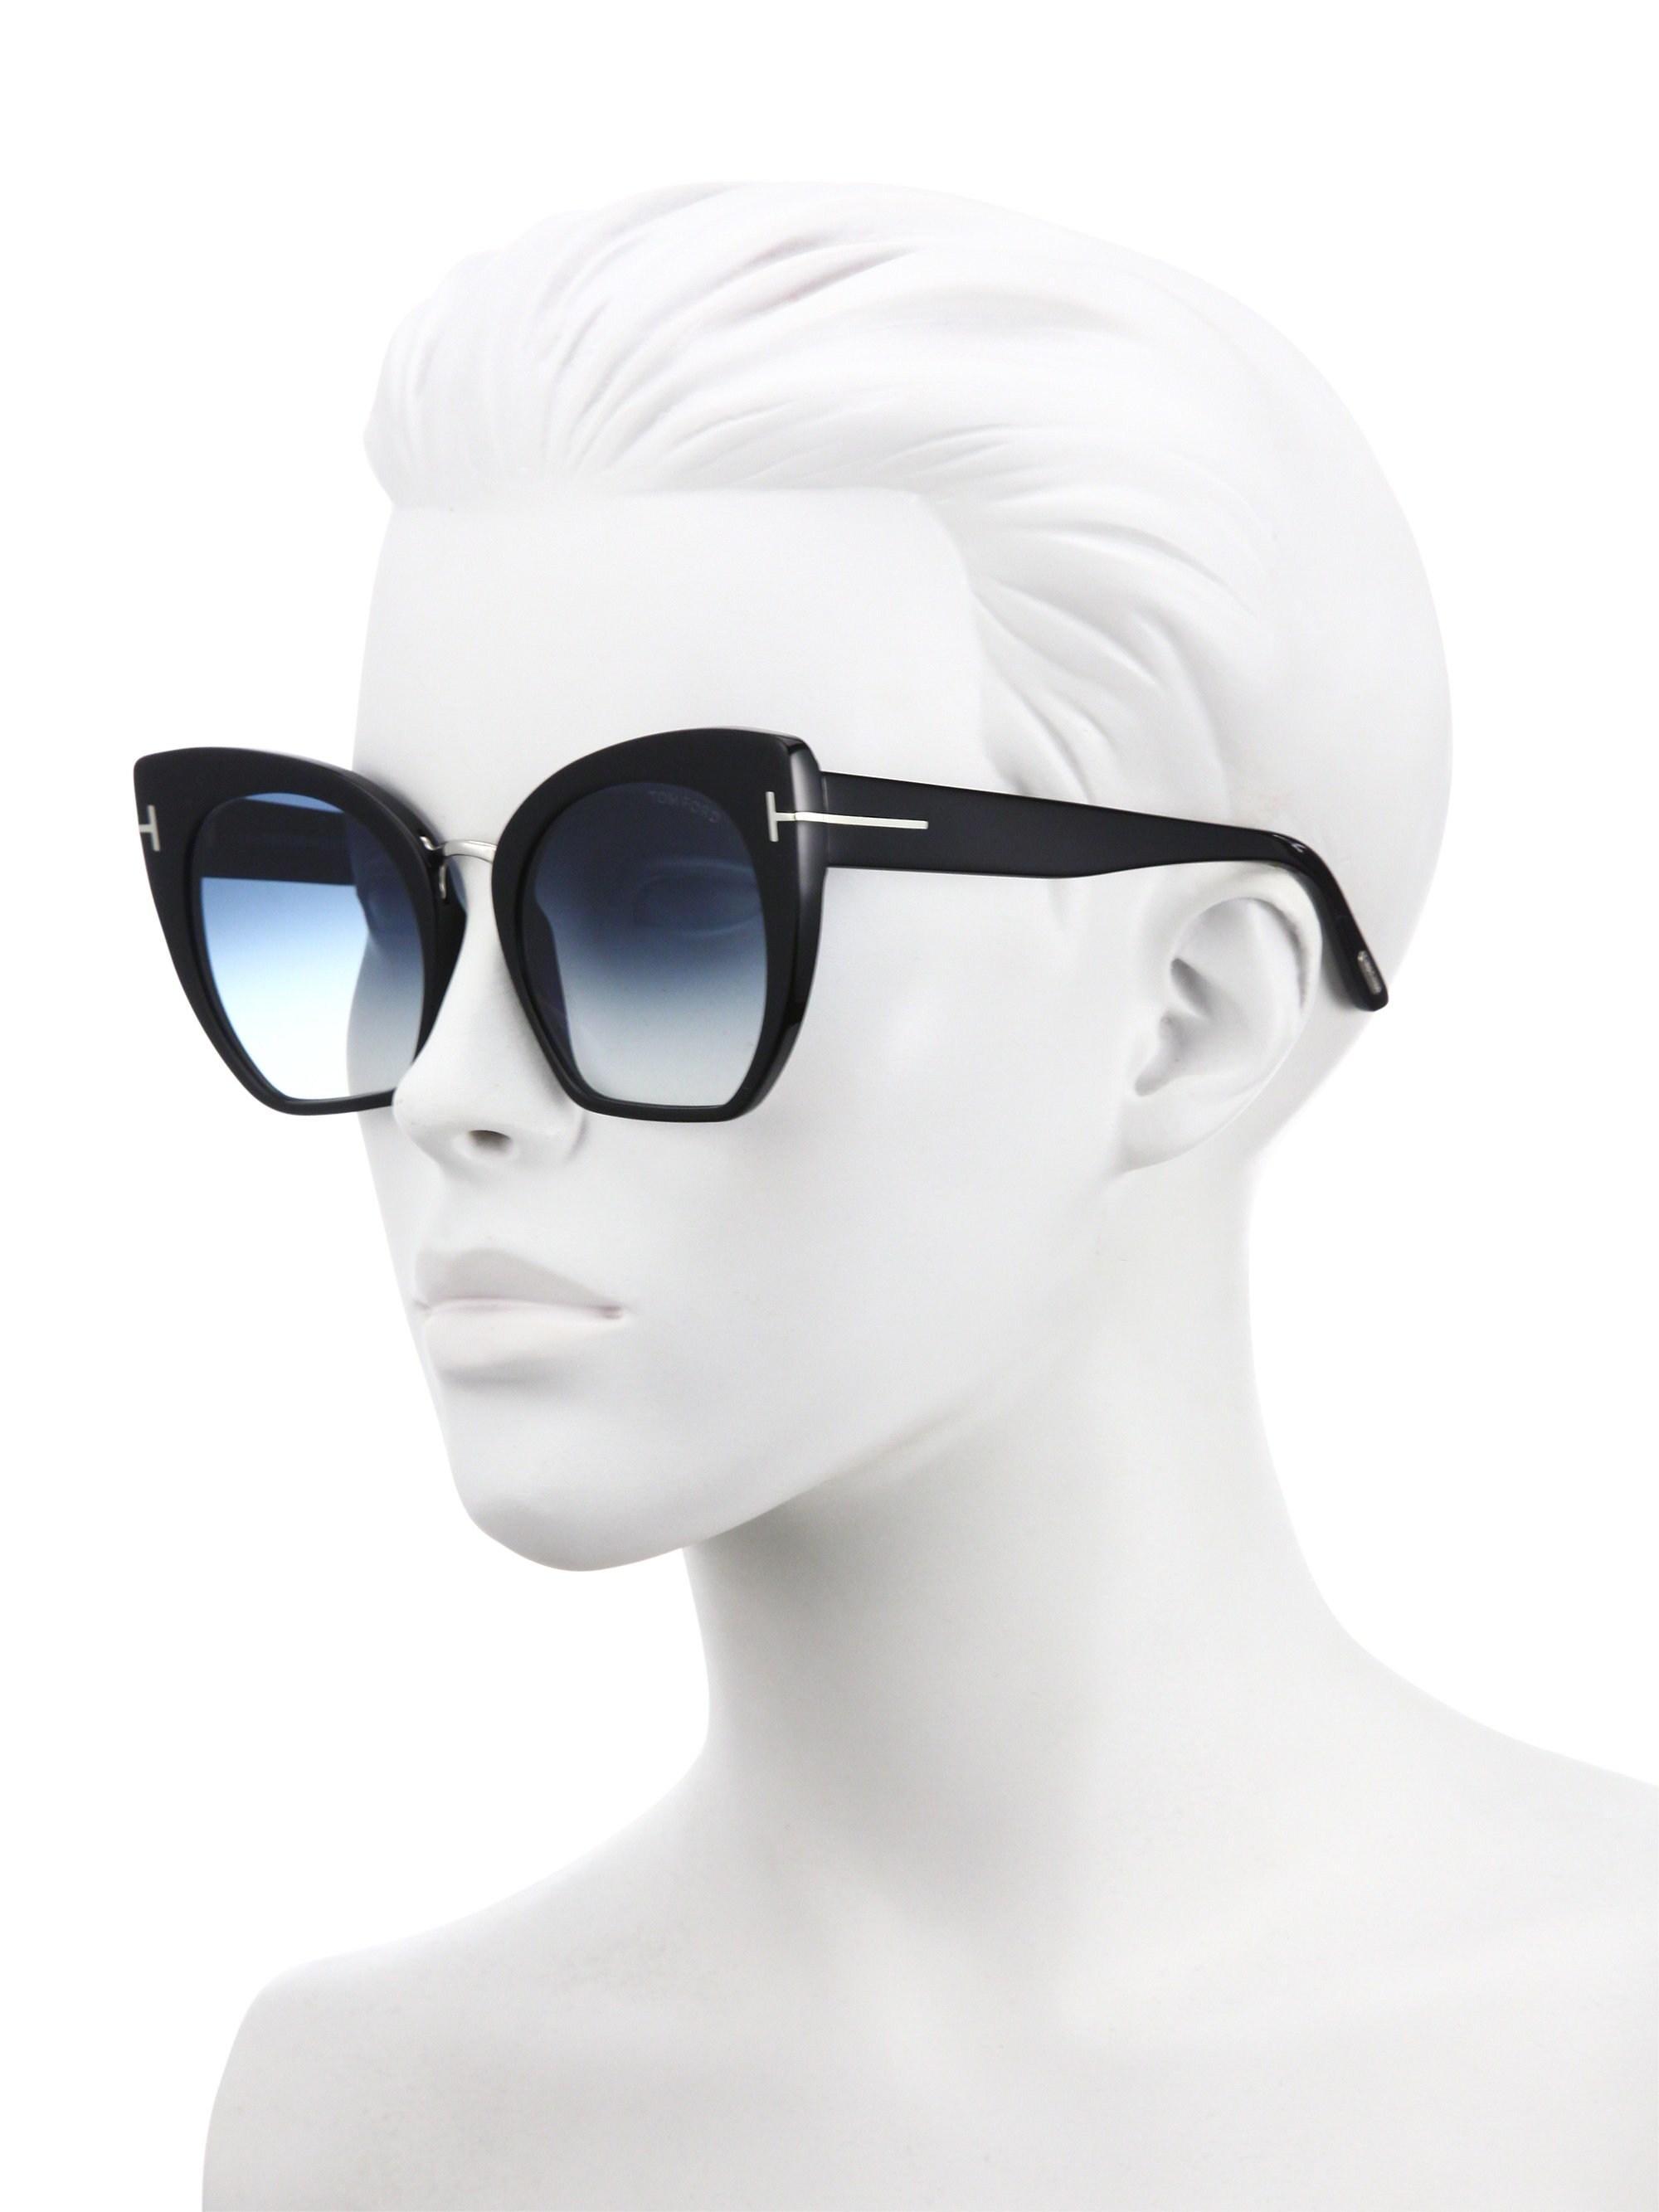 0e61484cc8d Tom Ford - Samantha Cropped Cat-eye Sunglasses black - Lyst. View fullscreen